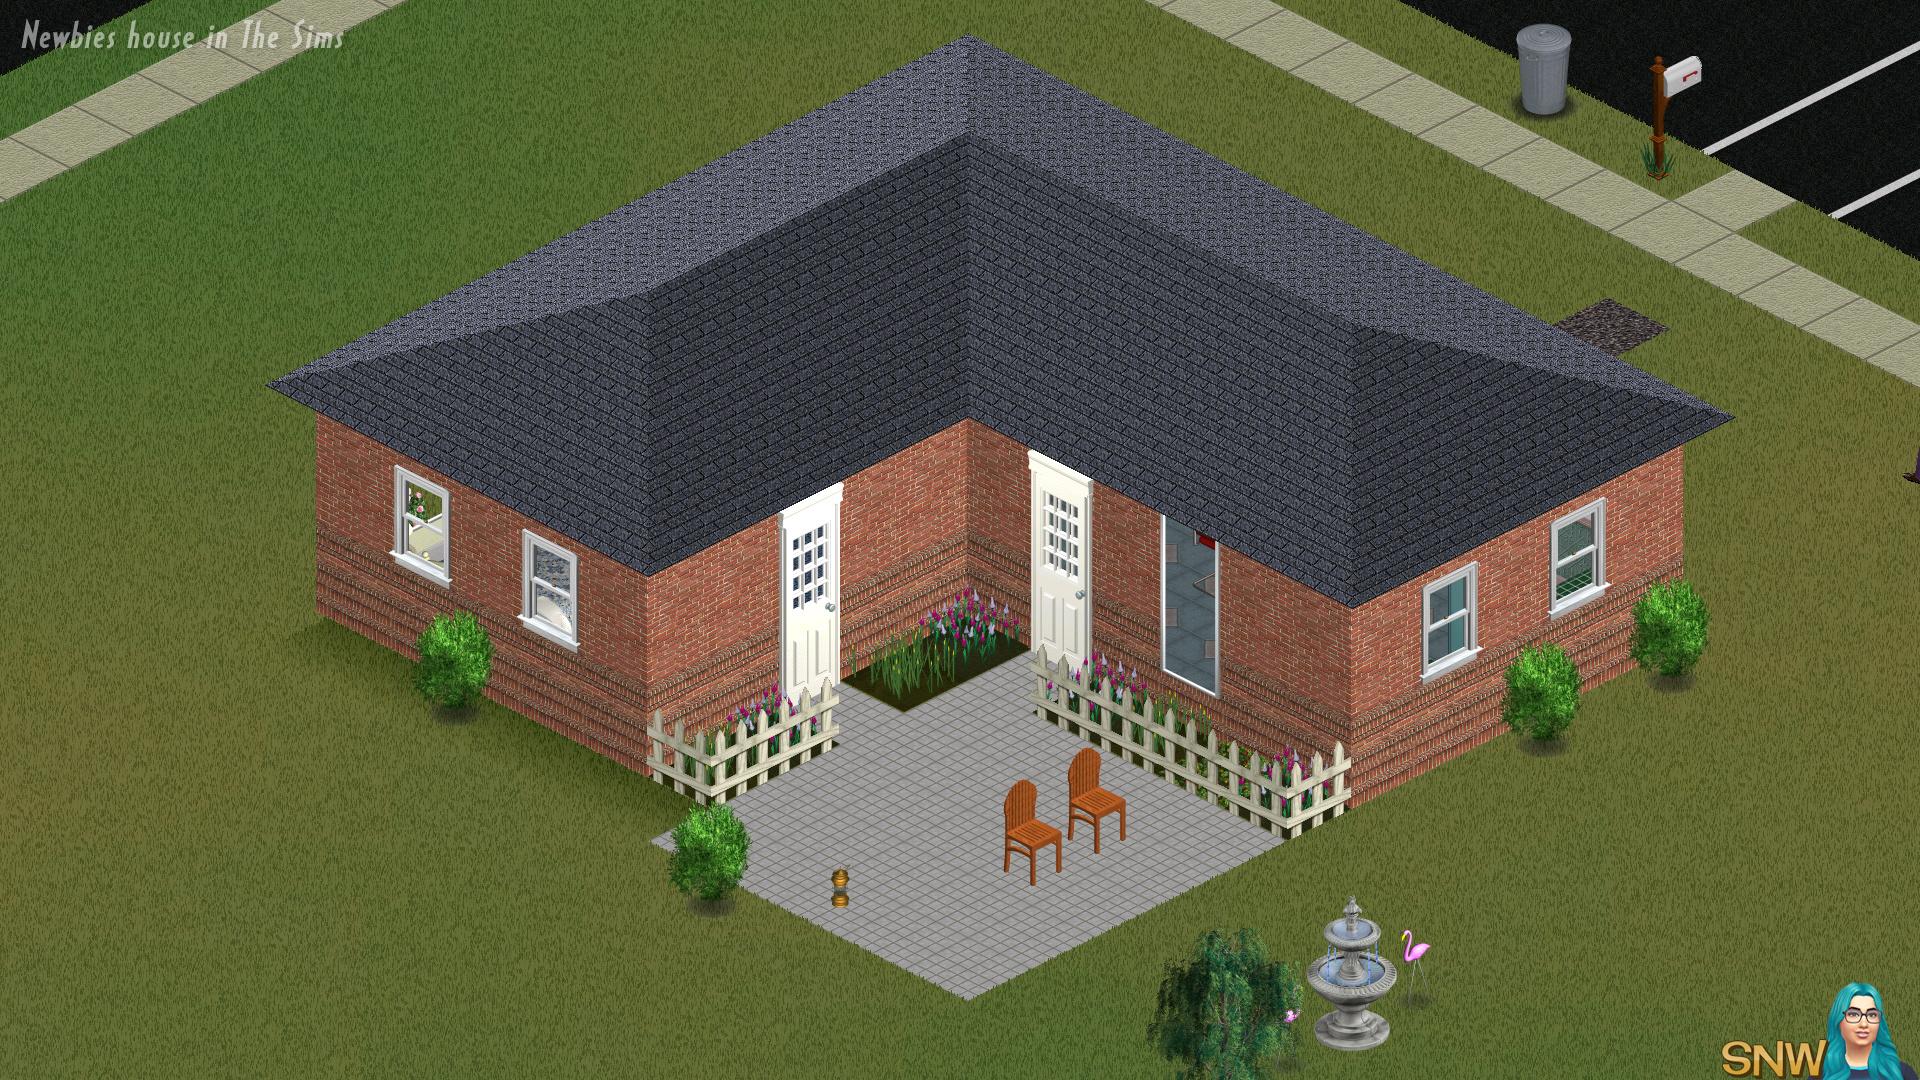 Newbies House